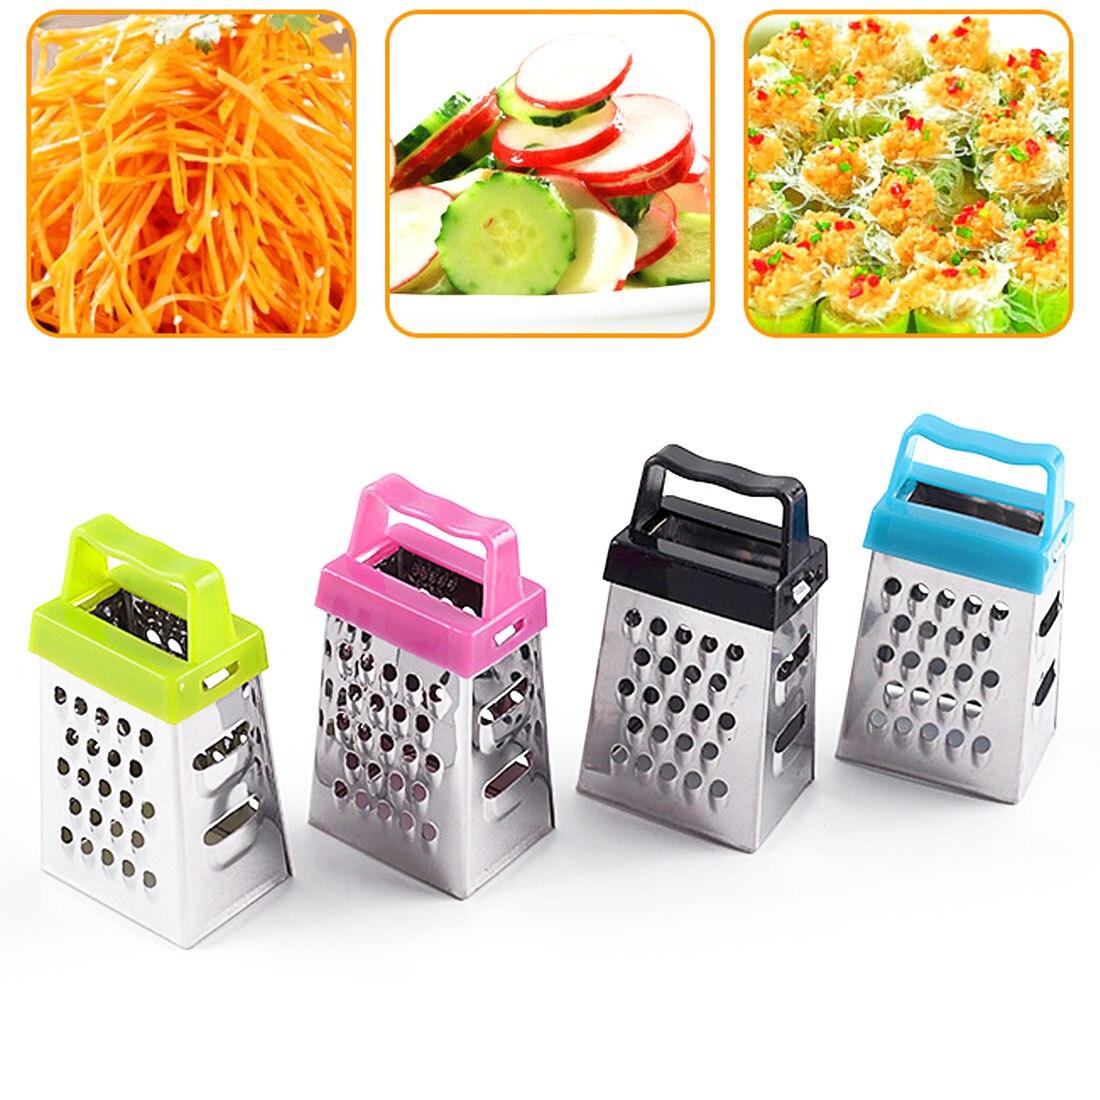 New Mini 4 Sides Multifunction Handheld Grater Slicer Small and versatile Vegetable Fruit Peeler Slicer Kitchen Tools Gadget